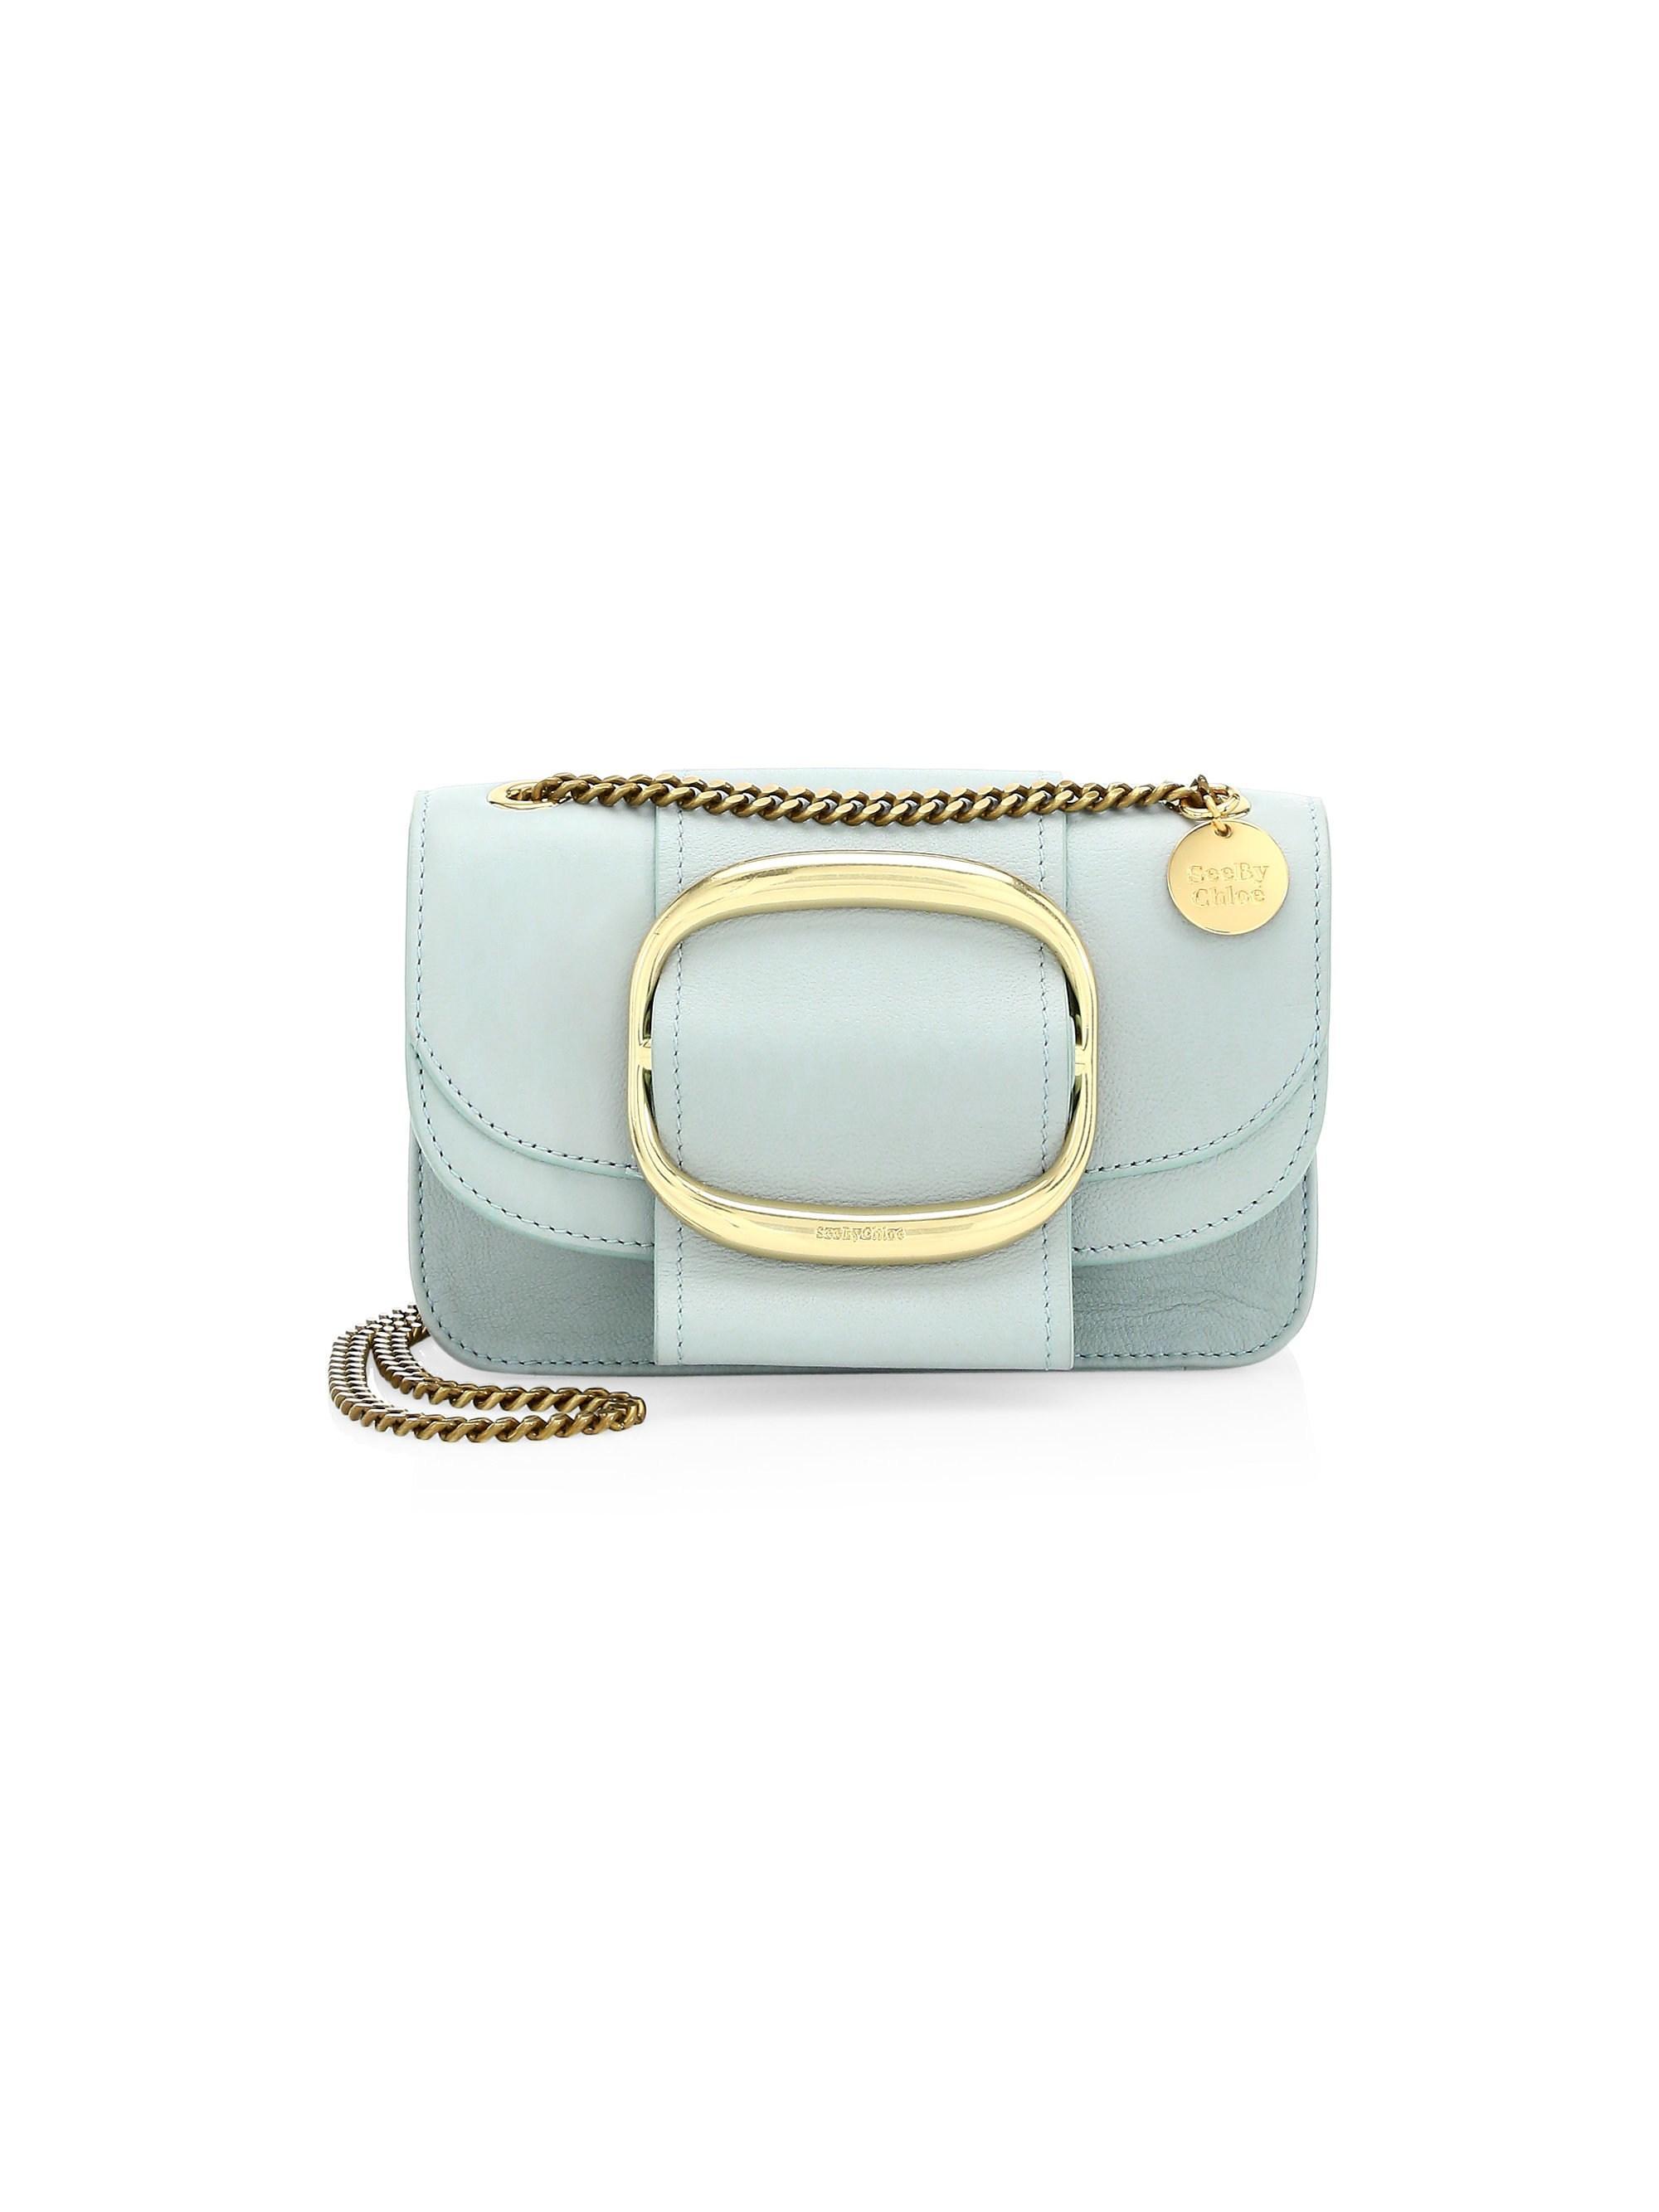 2401dd2a Lyst - See By Chloé Women's Small Hopper Leather Crossbody Bag - Icy ...